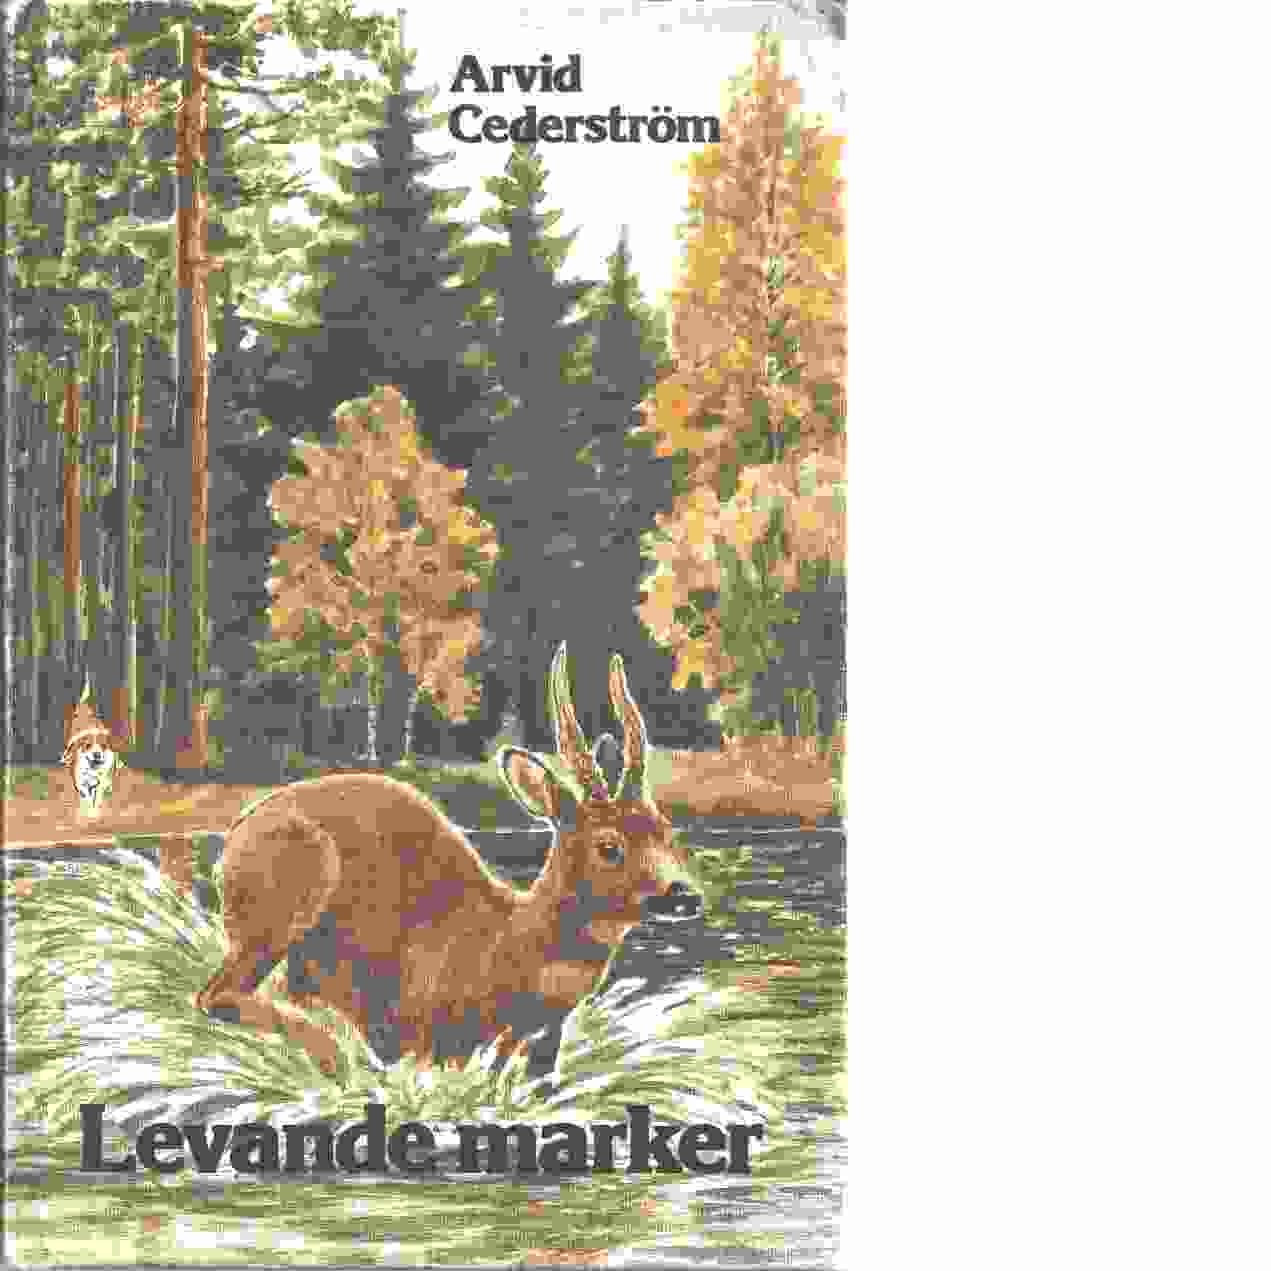 Levande marker - Cederström, Arvid